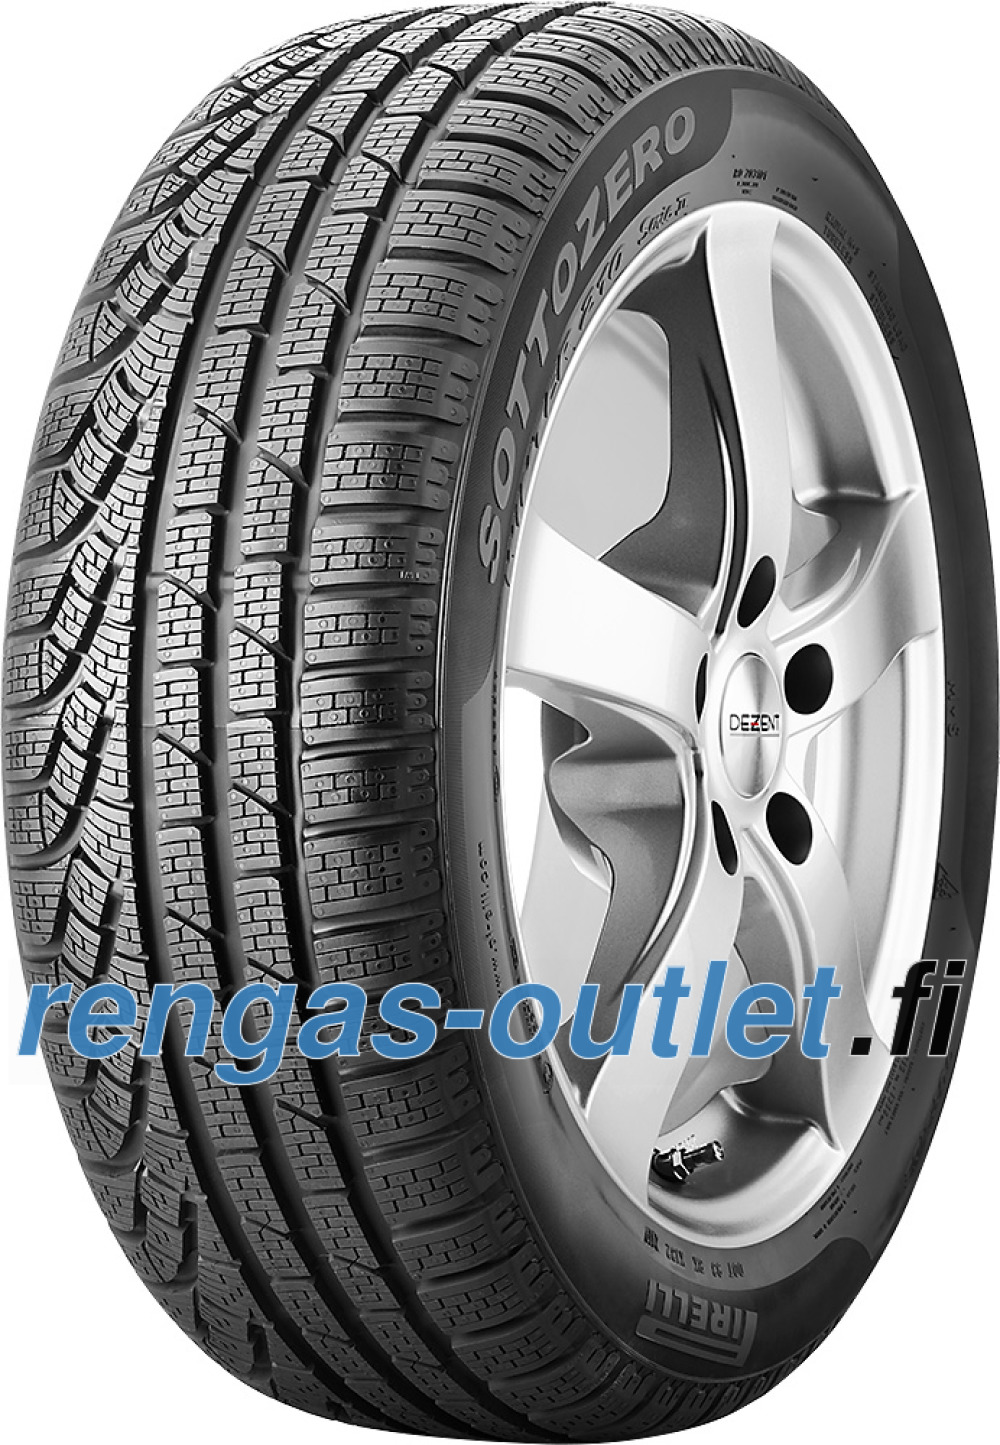 Pirelli W 210 SottoZero S2 runflat ( 205/55 R17 91H *, vannesuojalla (MFS), runflat )